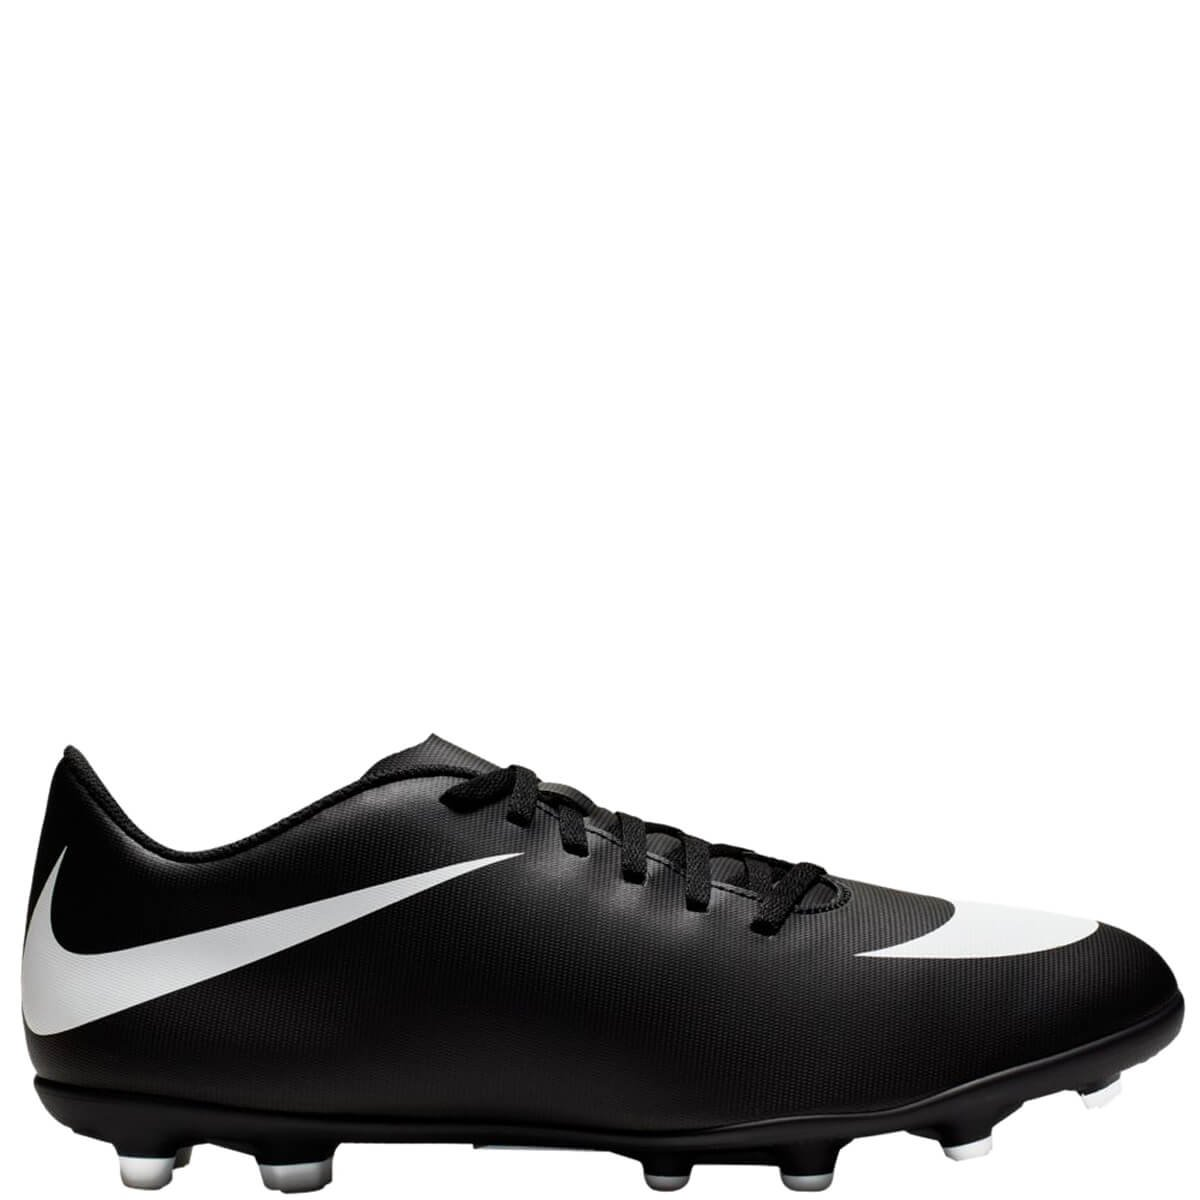 834bfae8cc06e Bizz Store - Chuteira Futebol de Campo Nike Bravata II FG Preta